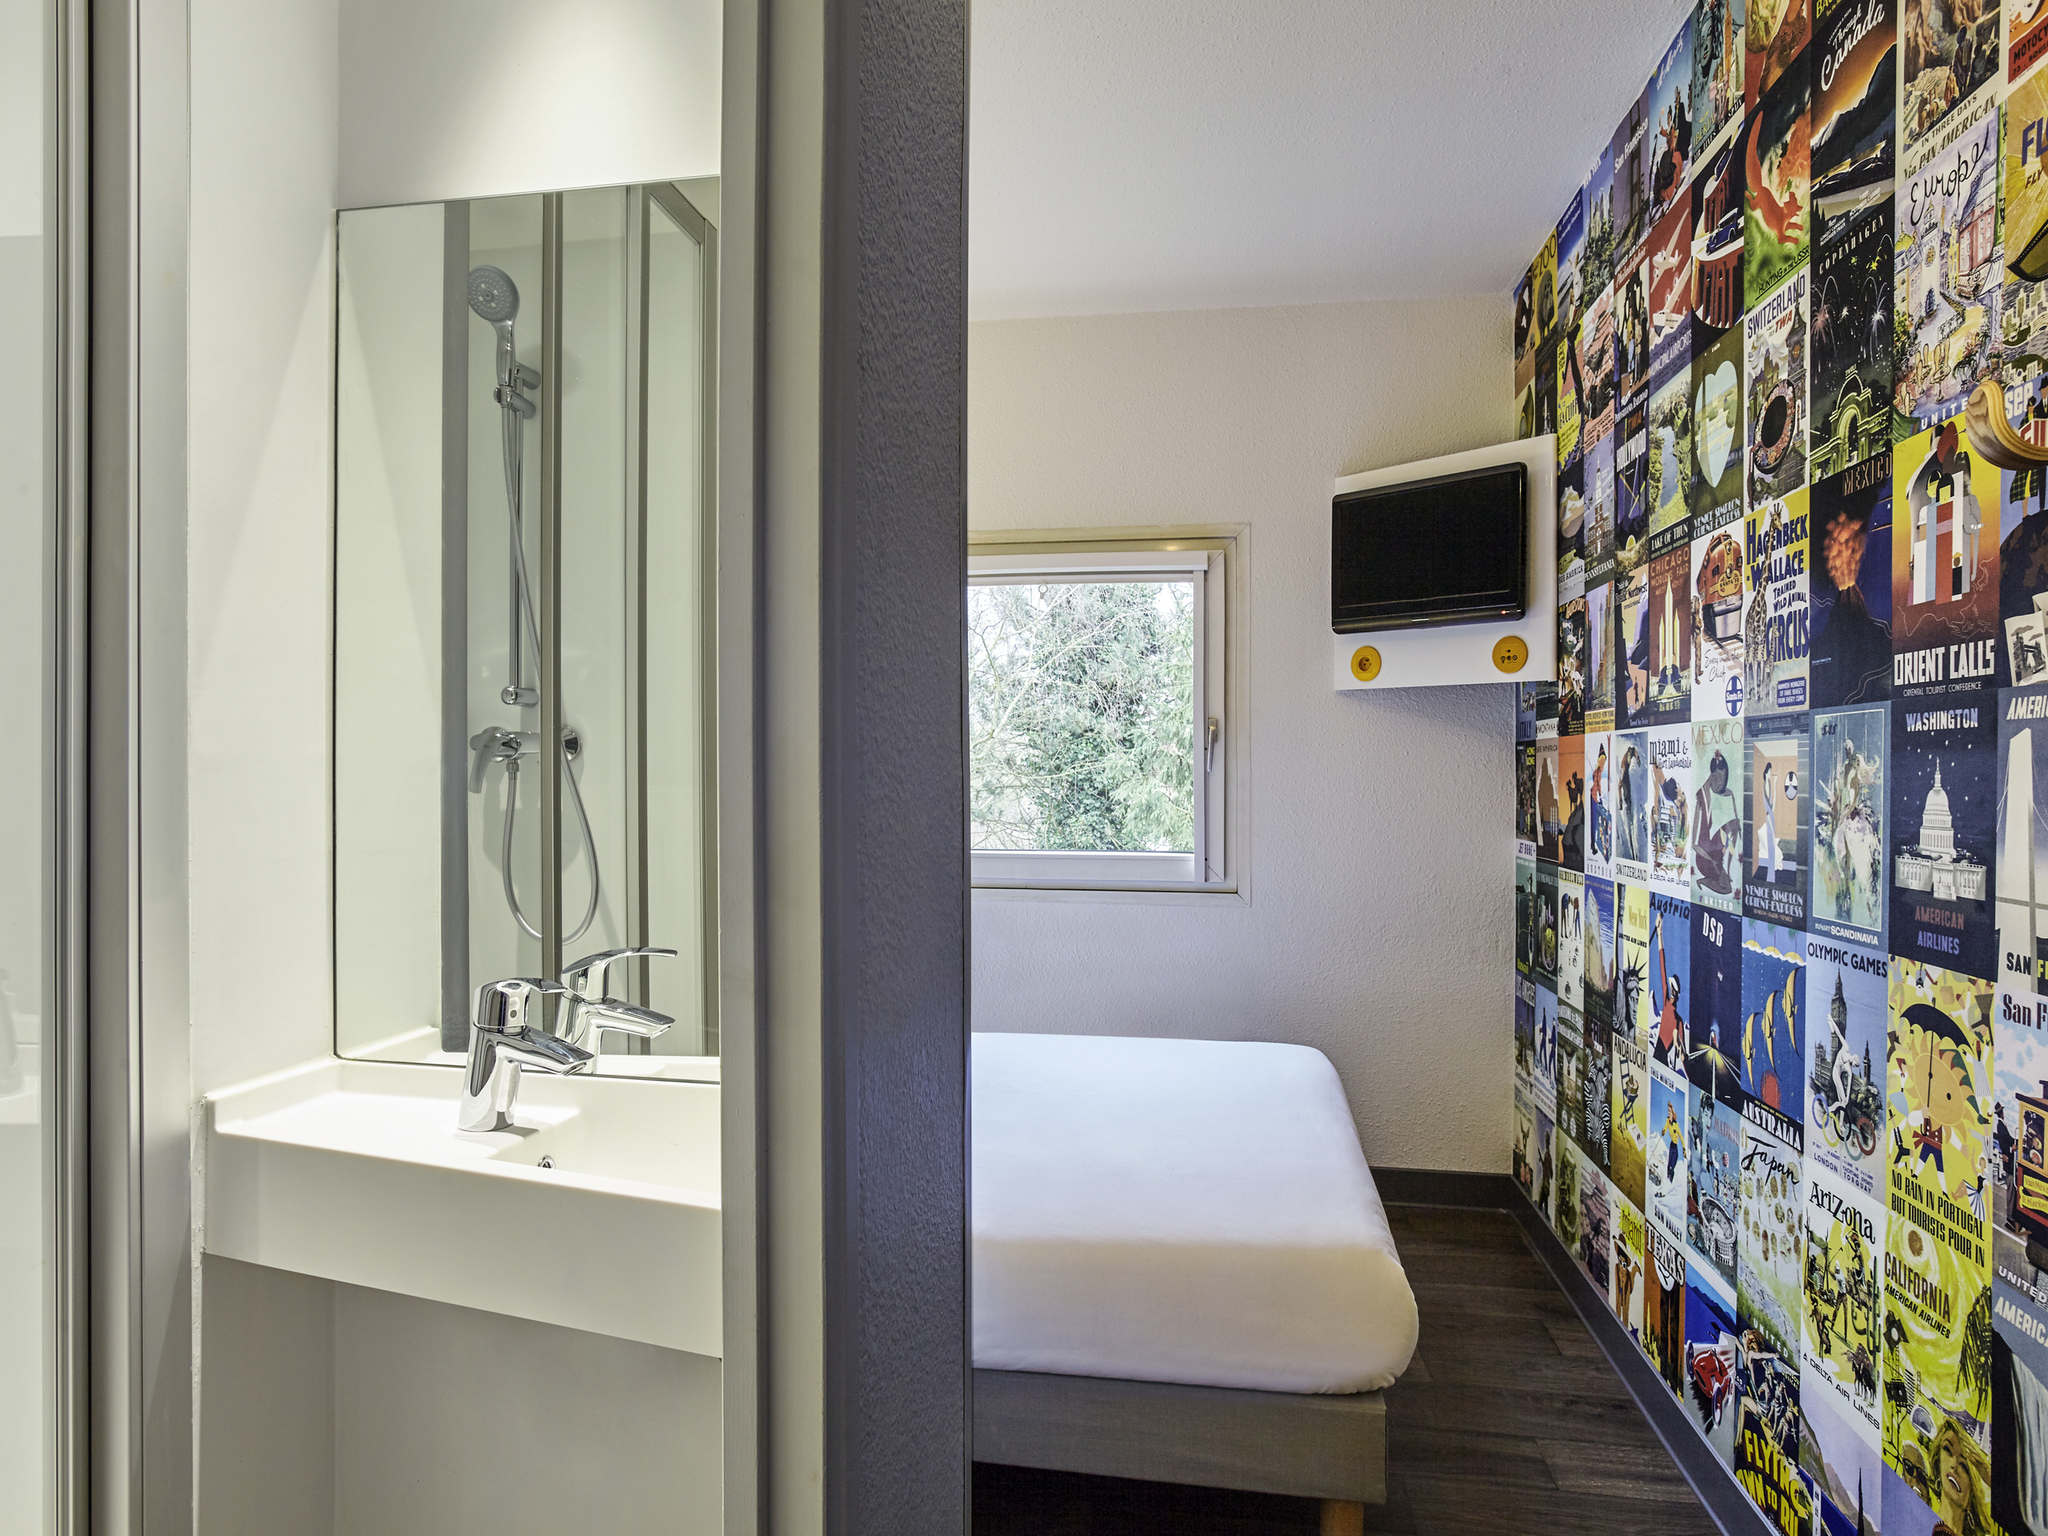 Hotel – hotelF1 Marsiglia Plan de Campagne N°1